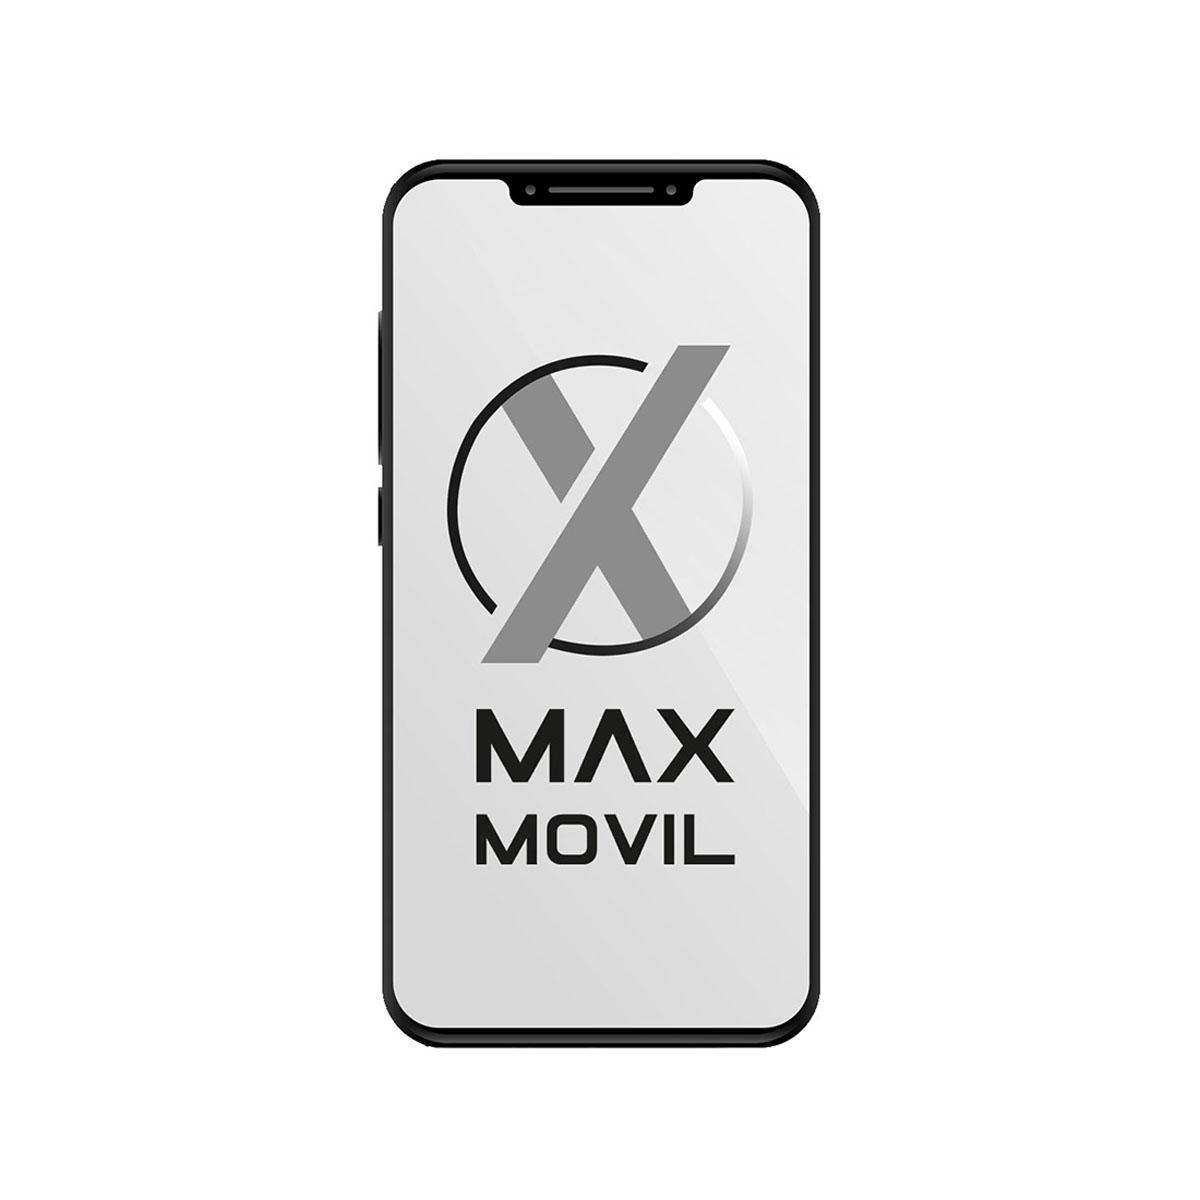 Huawei P9 Mystic Silver libre en MAXmovil